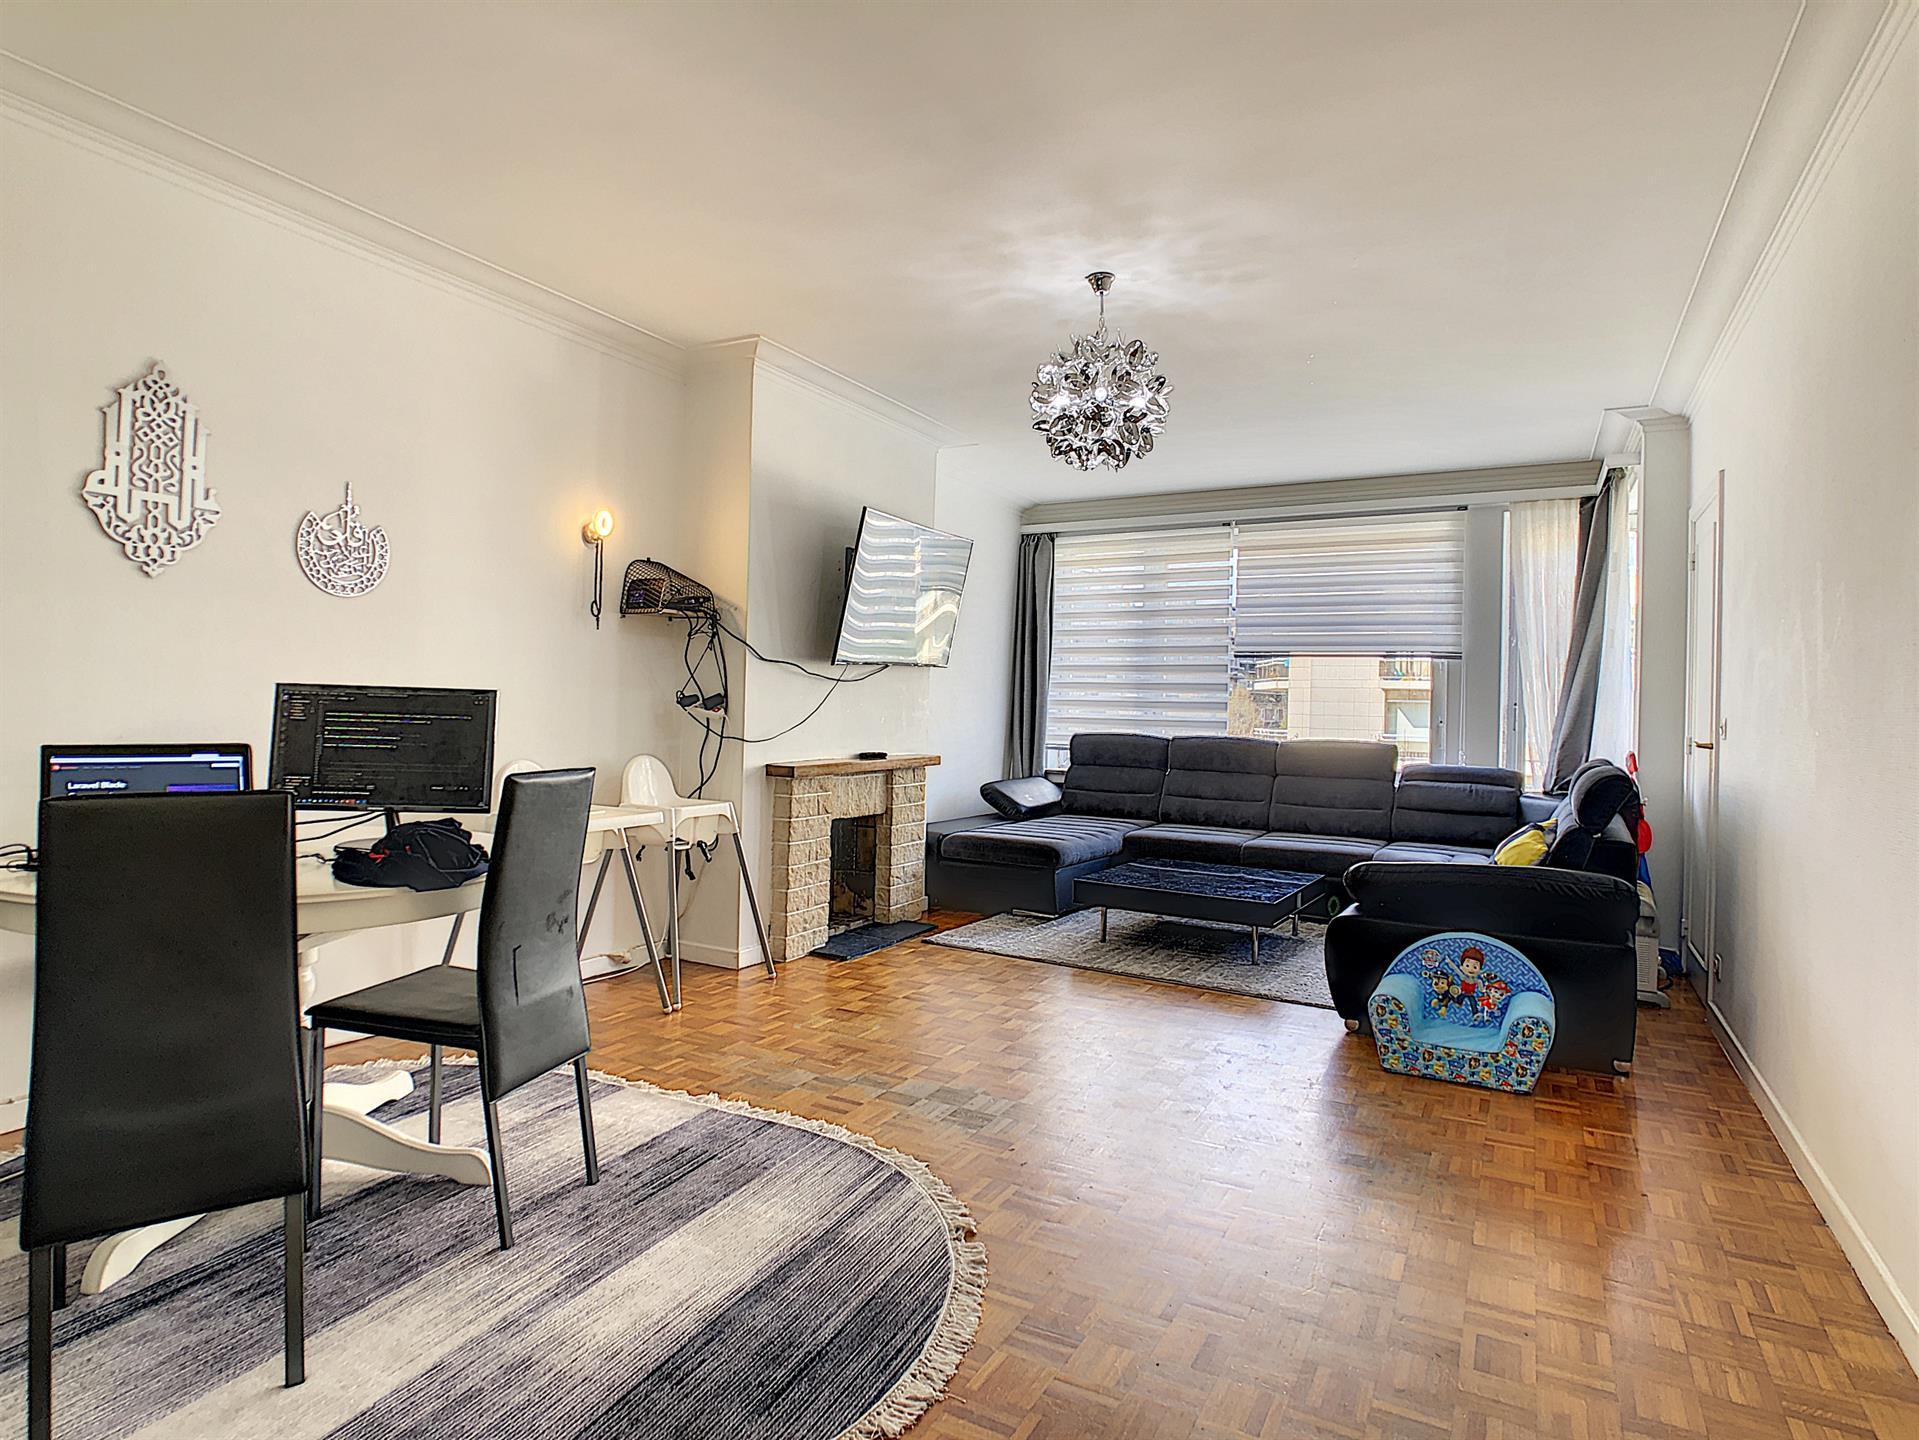 Appartement - Molenbeek-Saint-Jean - #4318374-10